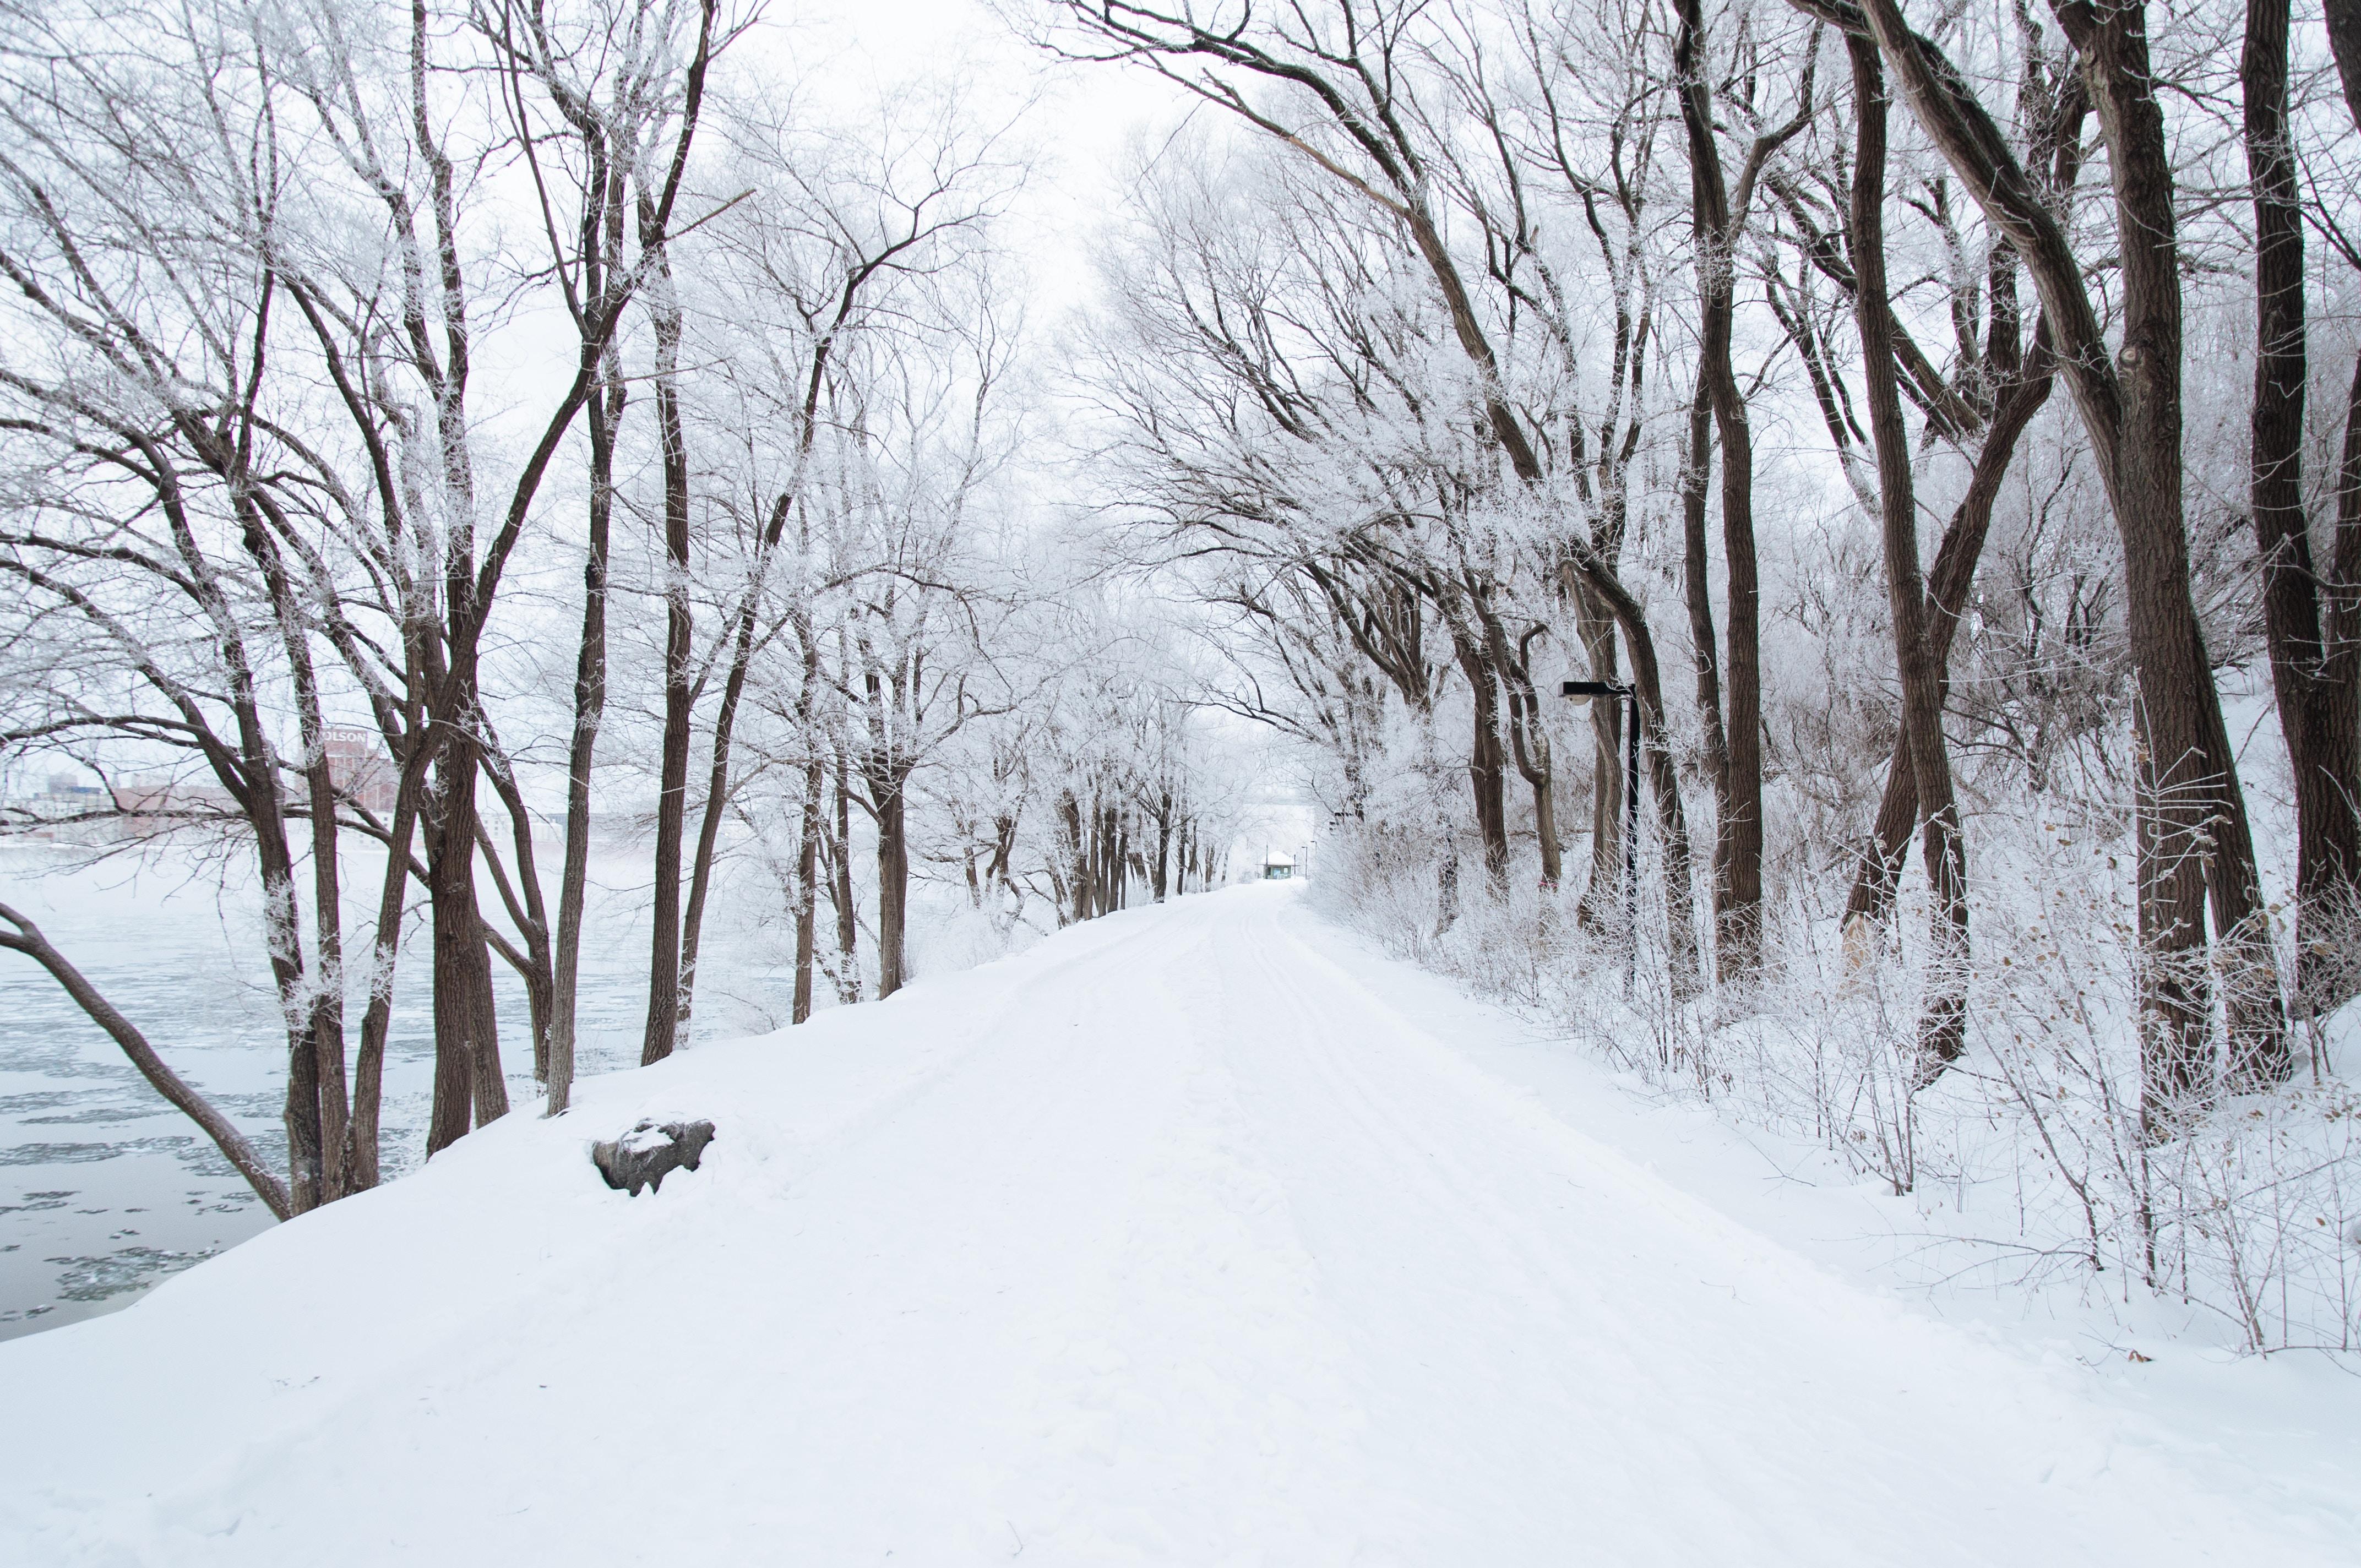 Do You Struggle With Seasonal Affective Disorder?